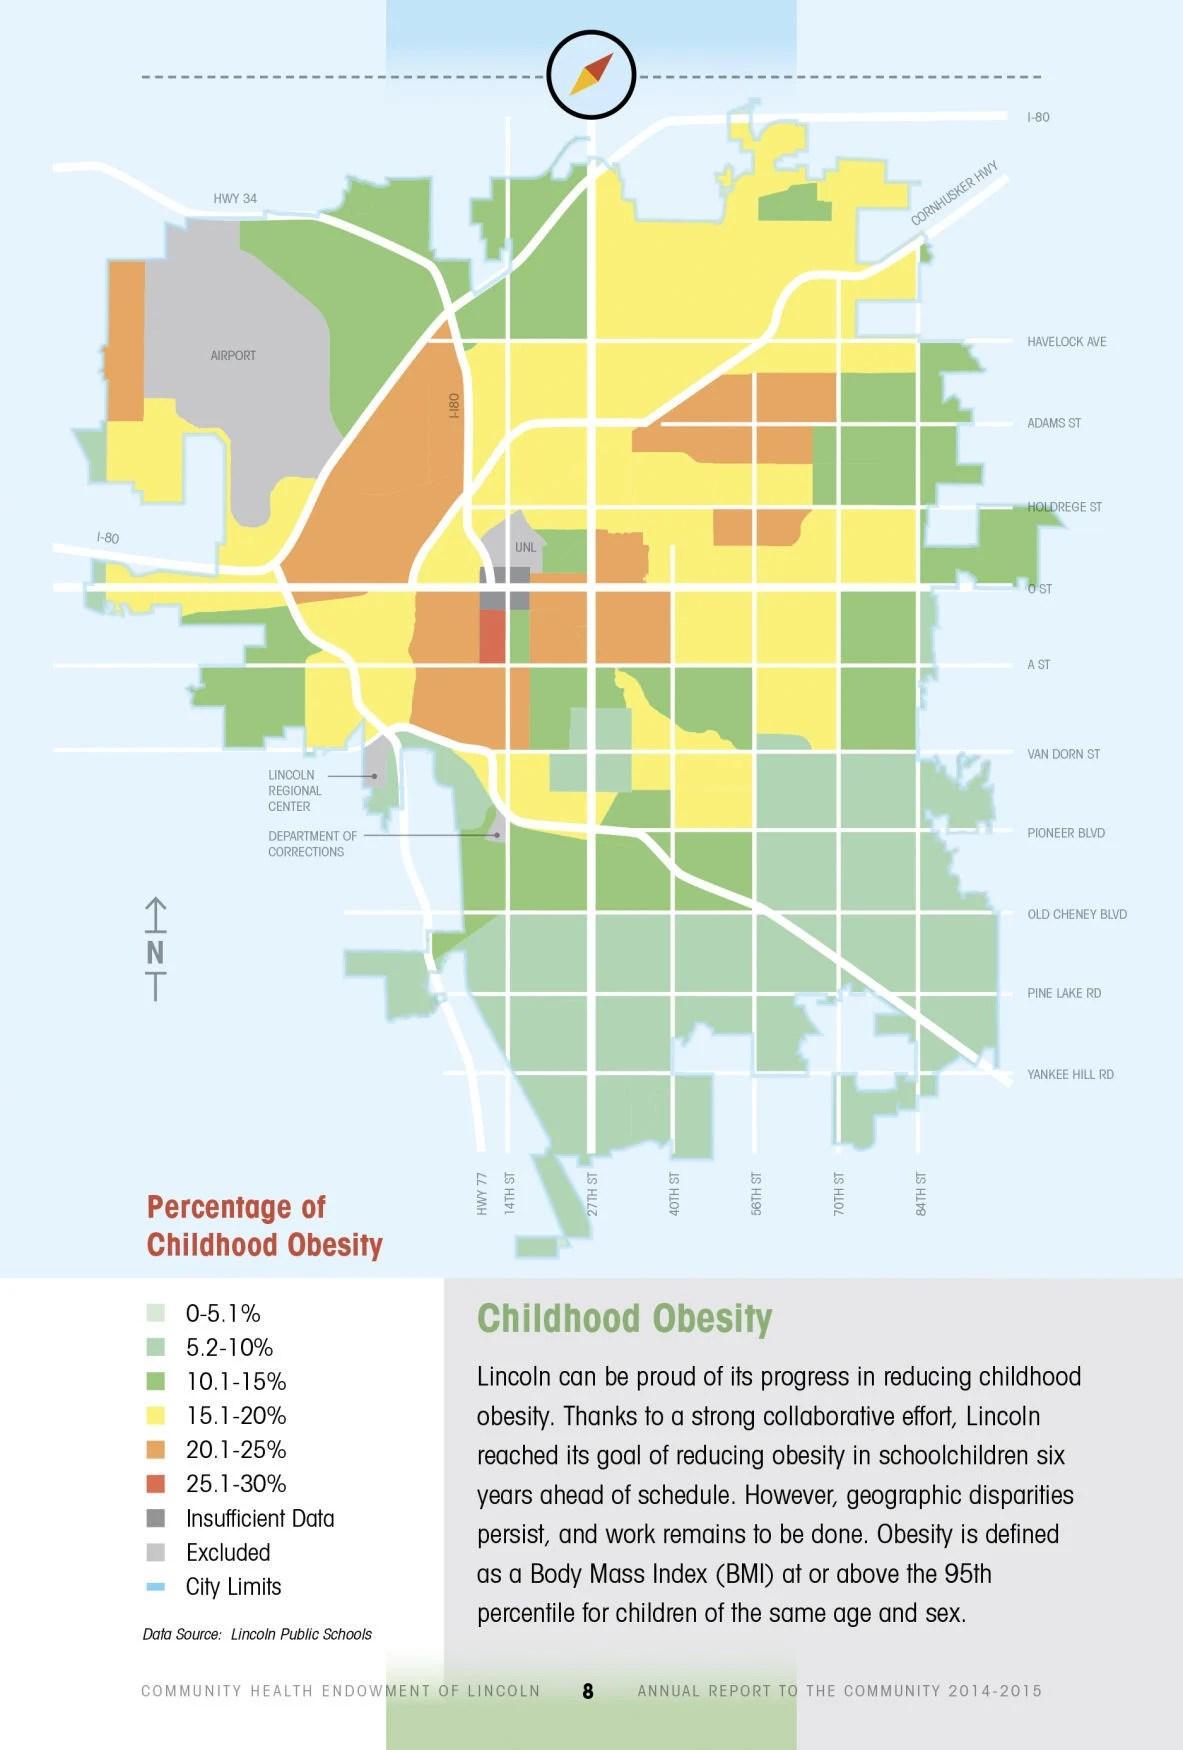 Lincoln Ne Zip Code Map : lincoln, Place, Matters:, Lincoln, Highlight, Health, Disparities, Across, Neighborhoods,, Codes, Family, Journalstar.com